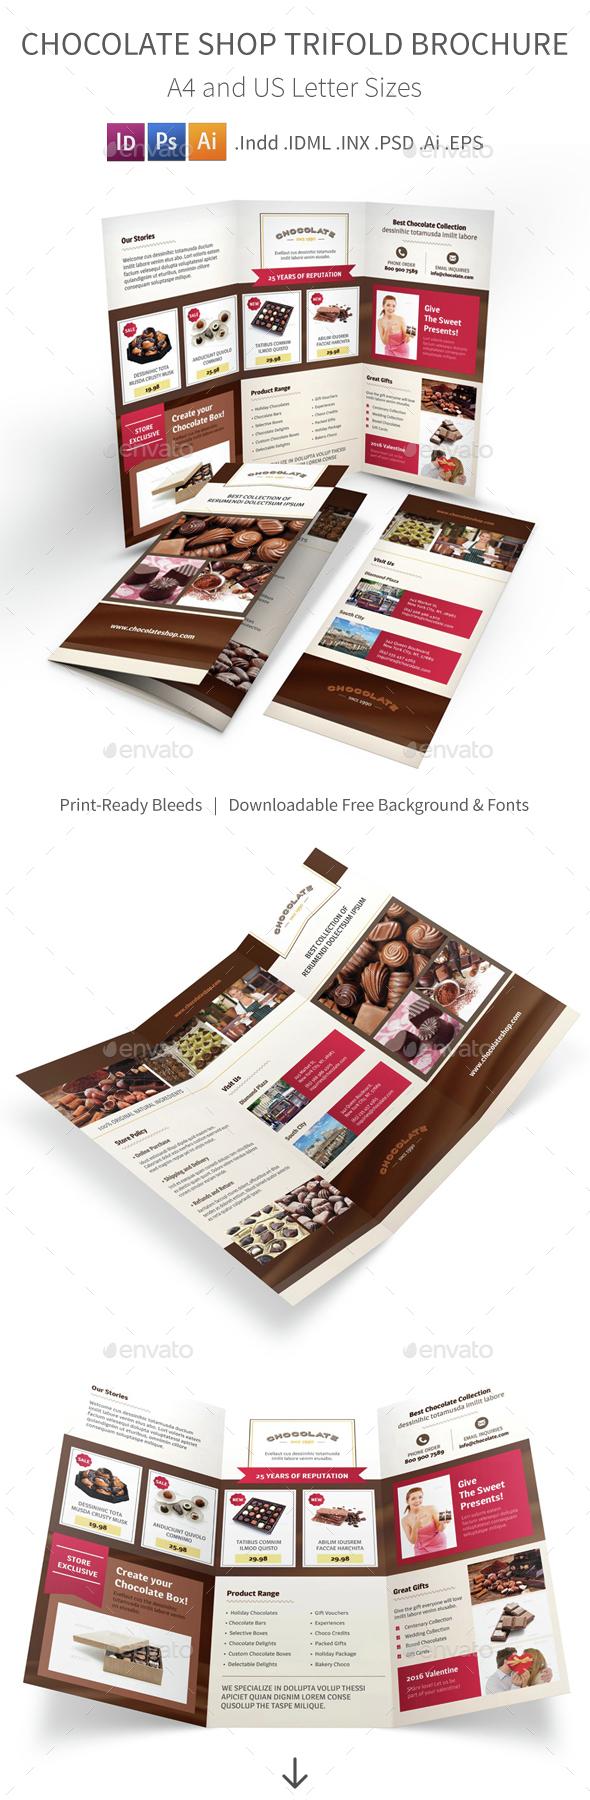 Chocolate Shop Trifold Brochure 2 - Informational Brochures